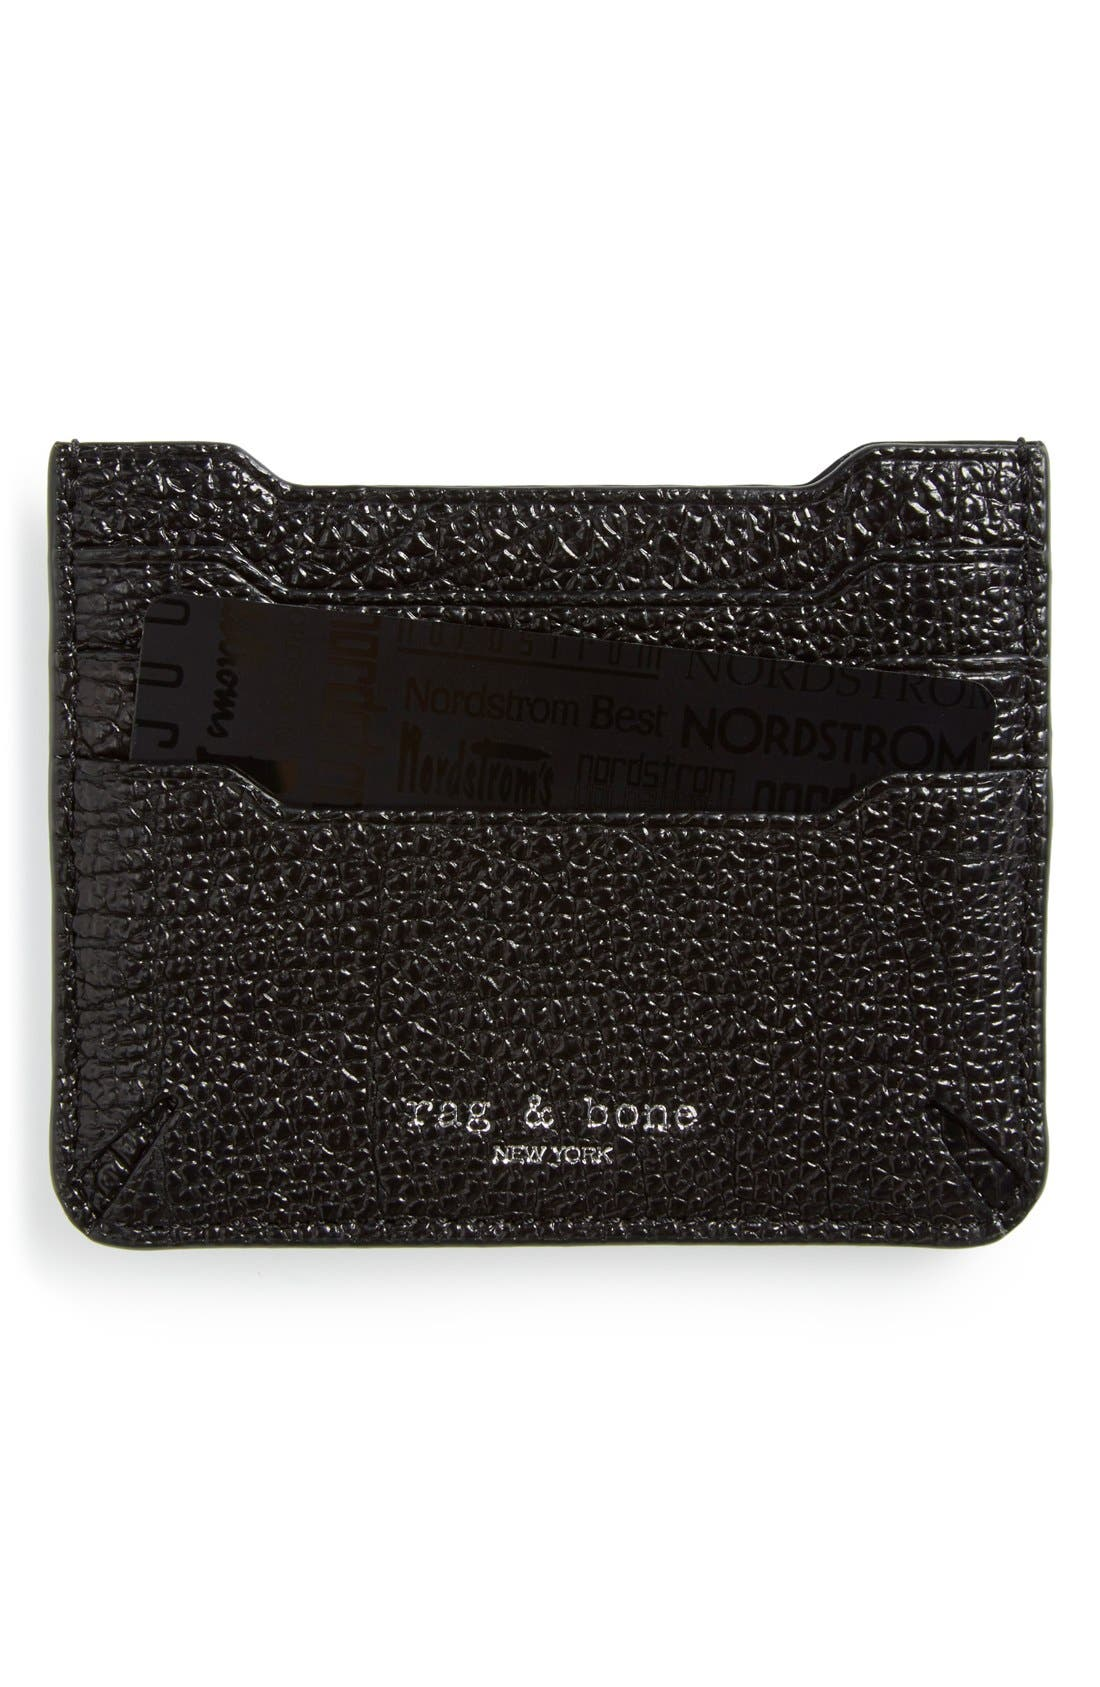 Main Image - rag & bone 'Crosby' Crackle Leather Card Case